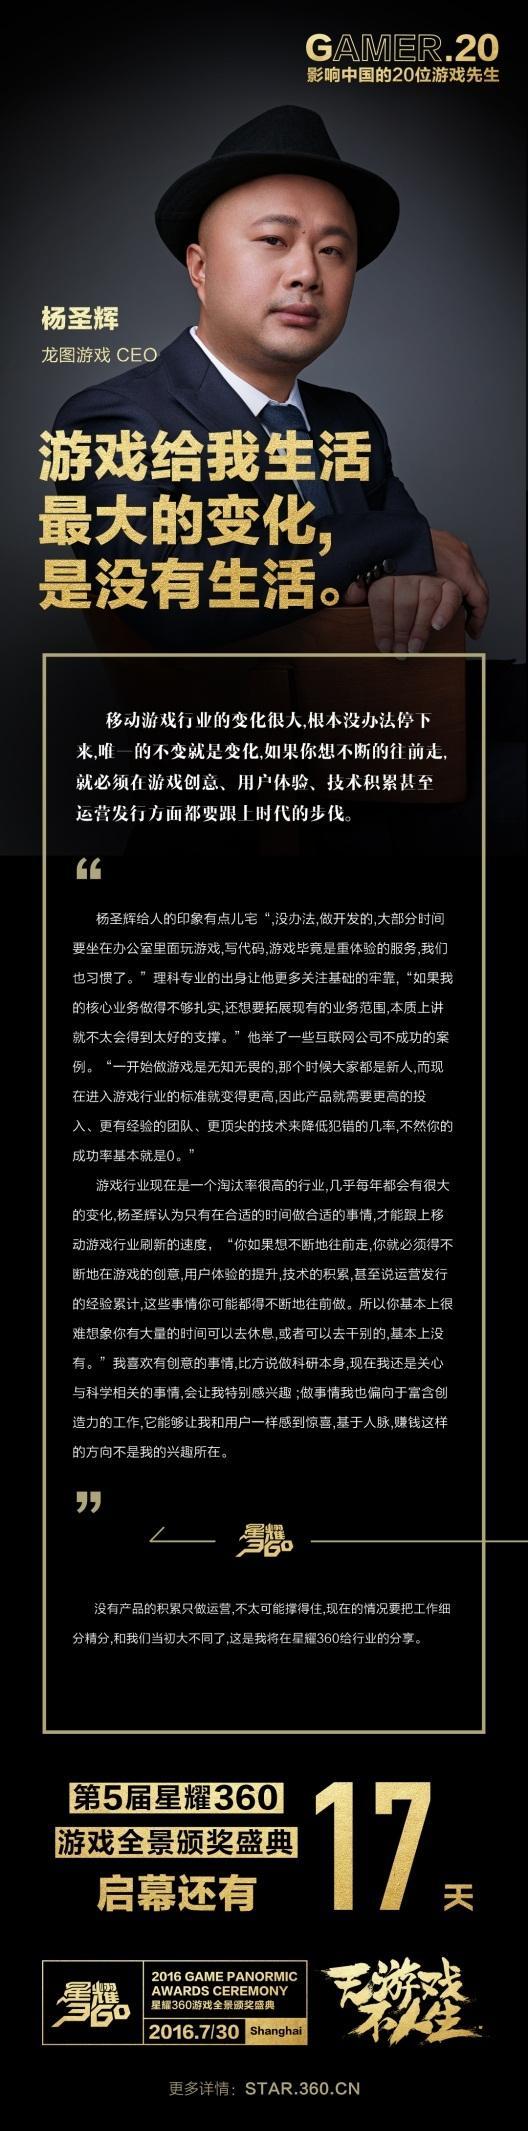 Gamer20杨圣辉:游戏给我生活最大的变化